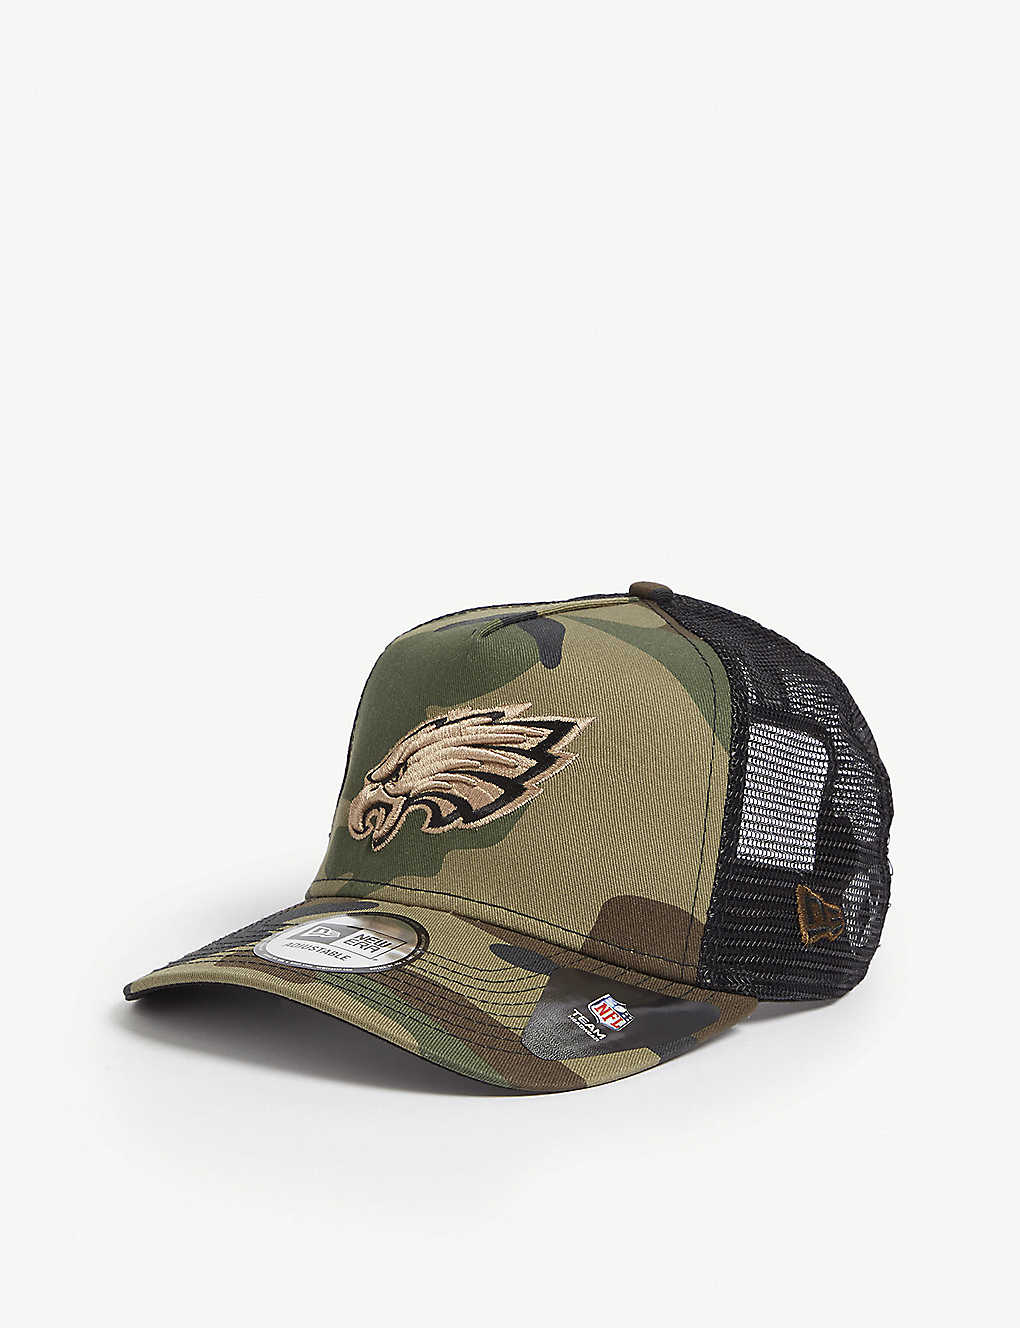 b23a7d87 Philadelphia Eagles camouflage mesh snapback cap